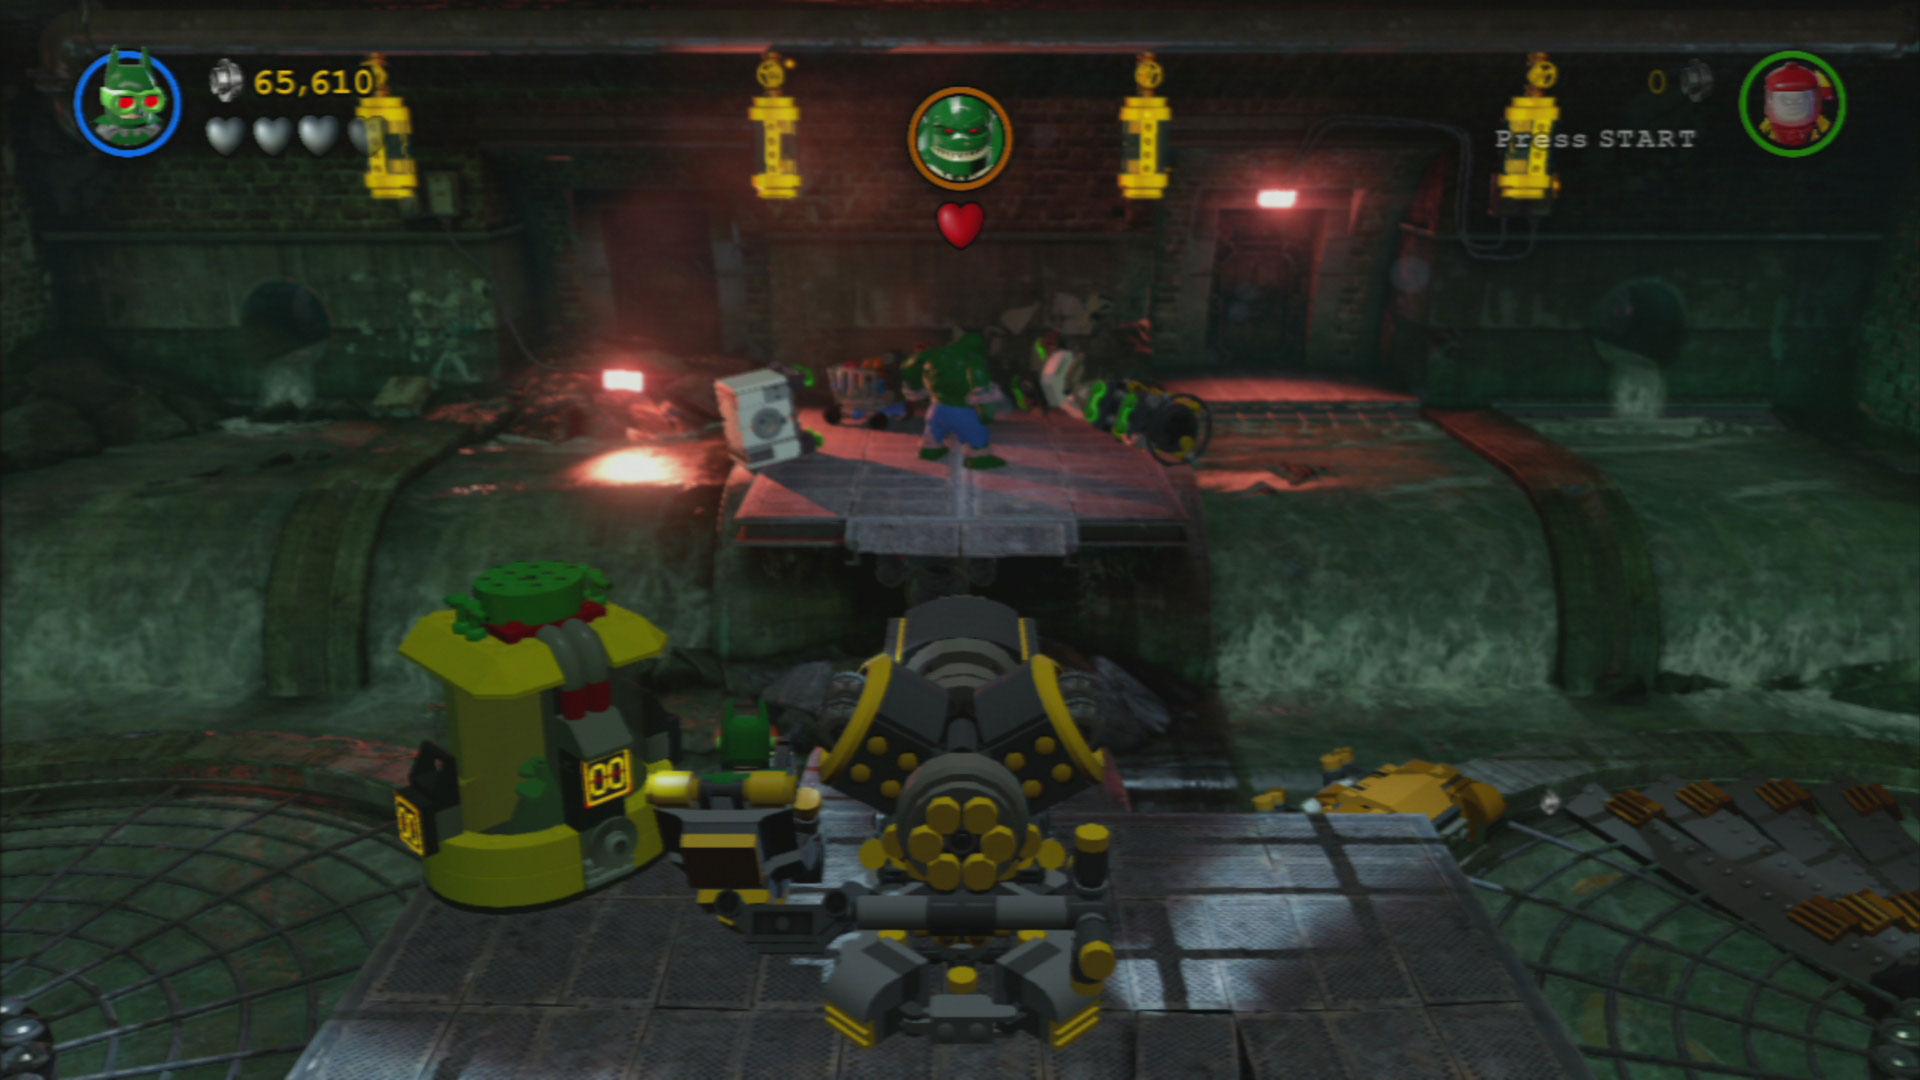 Lego Batman 3 Level 1 Pursuers In The Sewers Walkthrough